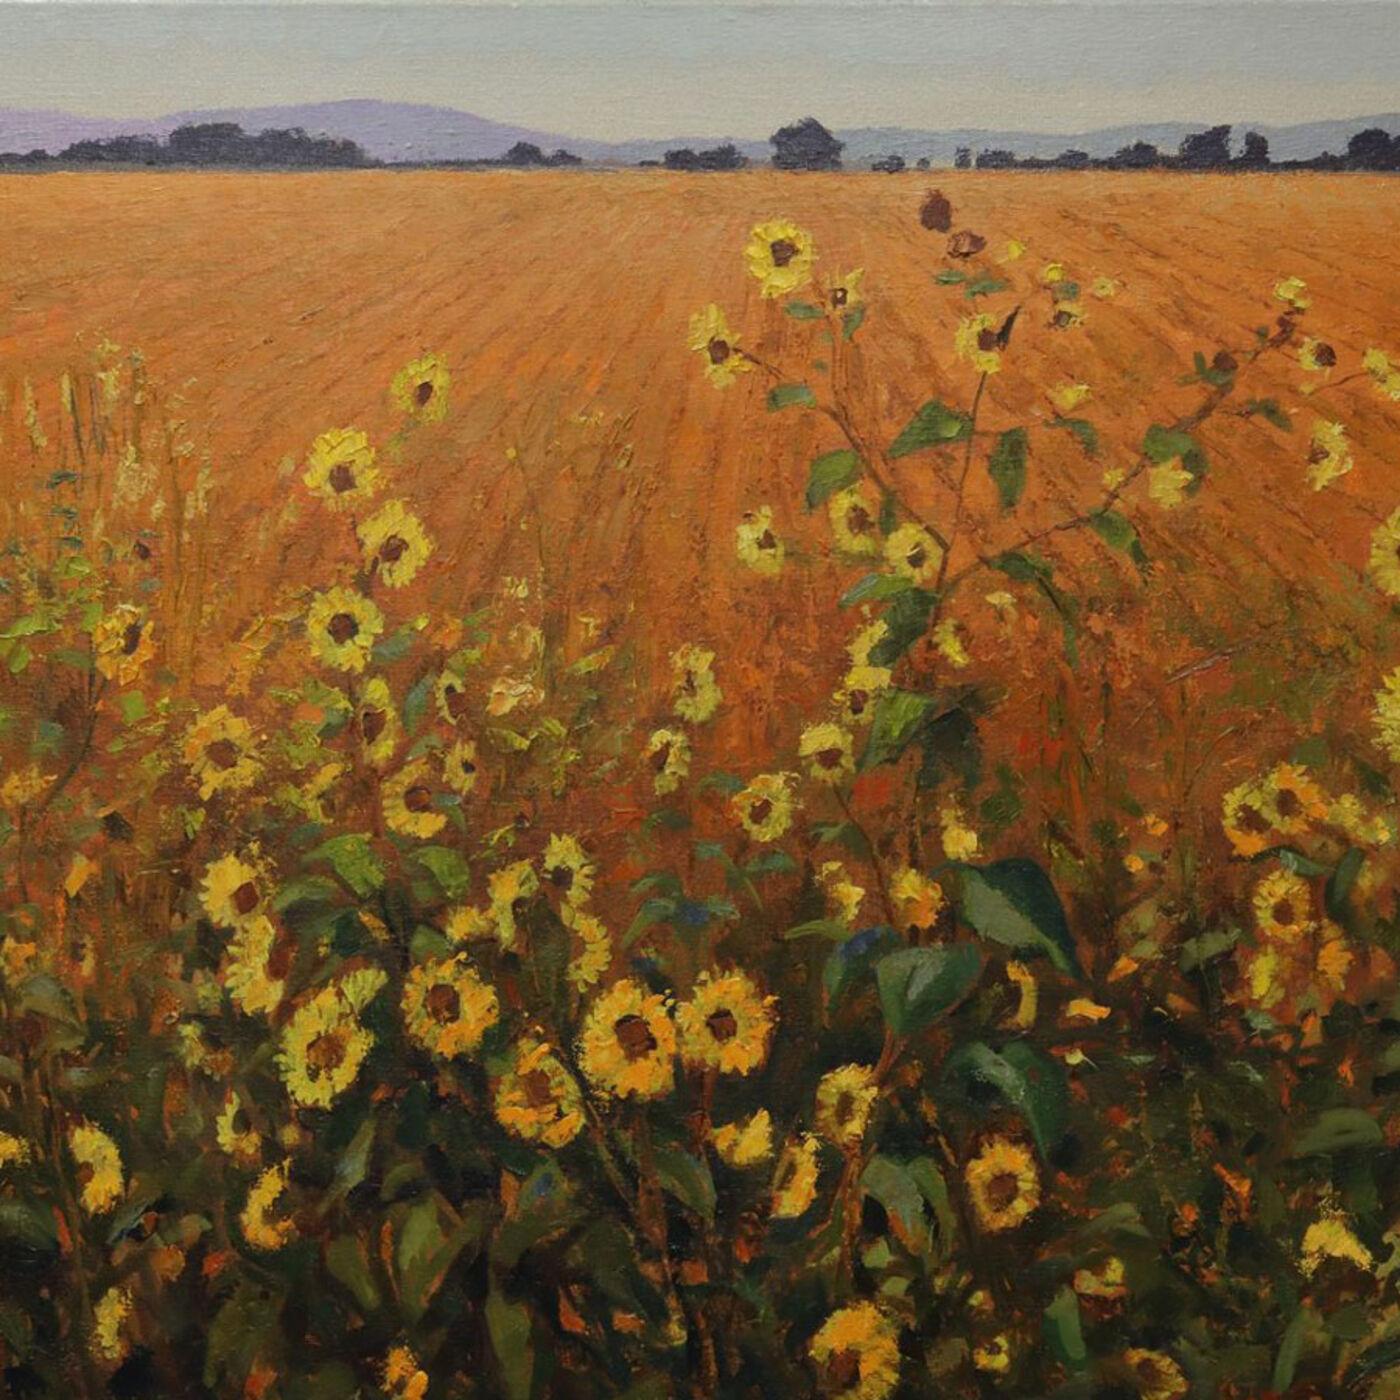 Gary Ernest Smith (Part TWO): Western Landscape Painter - Epi. 140, Host Dr. Mark Sublette